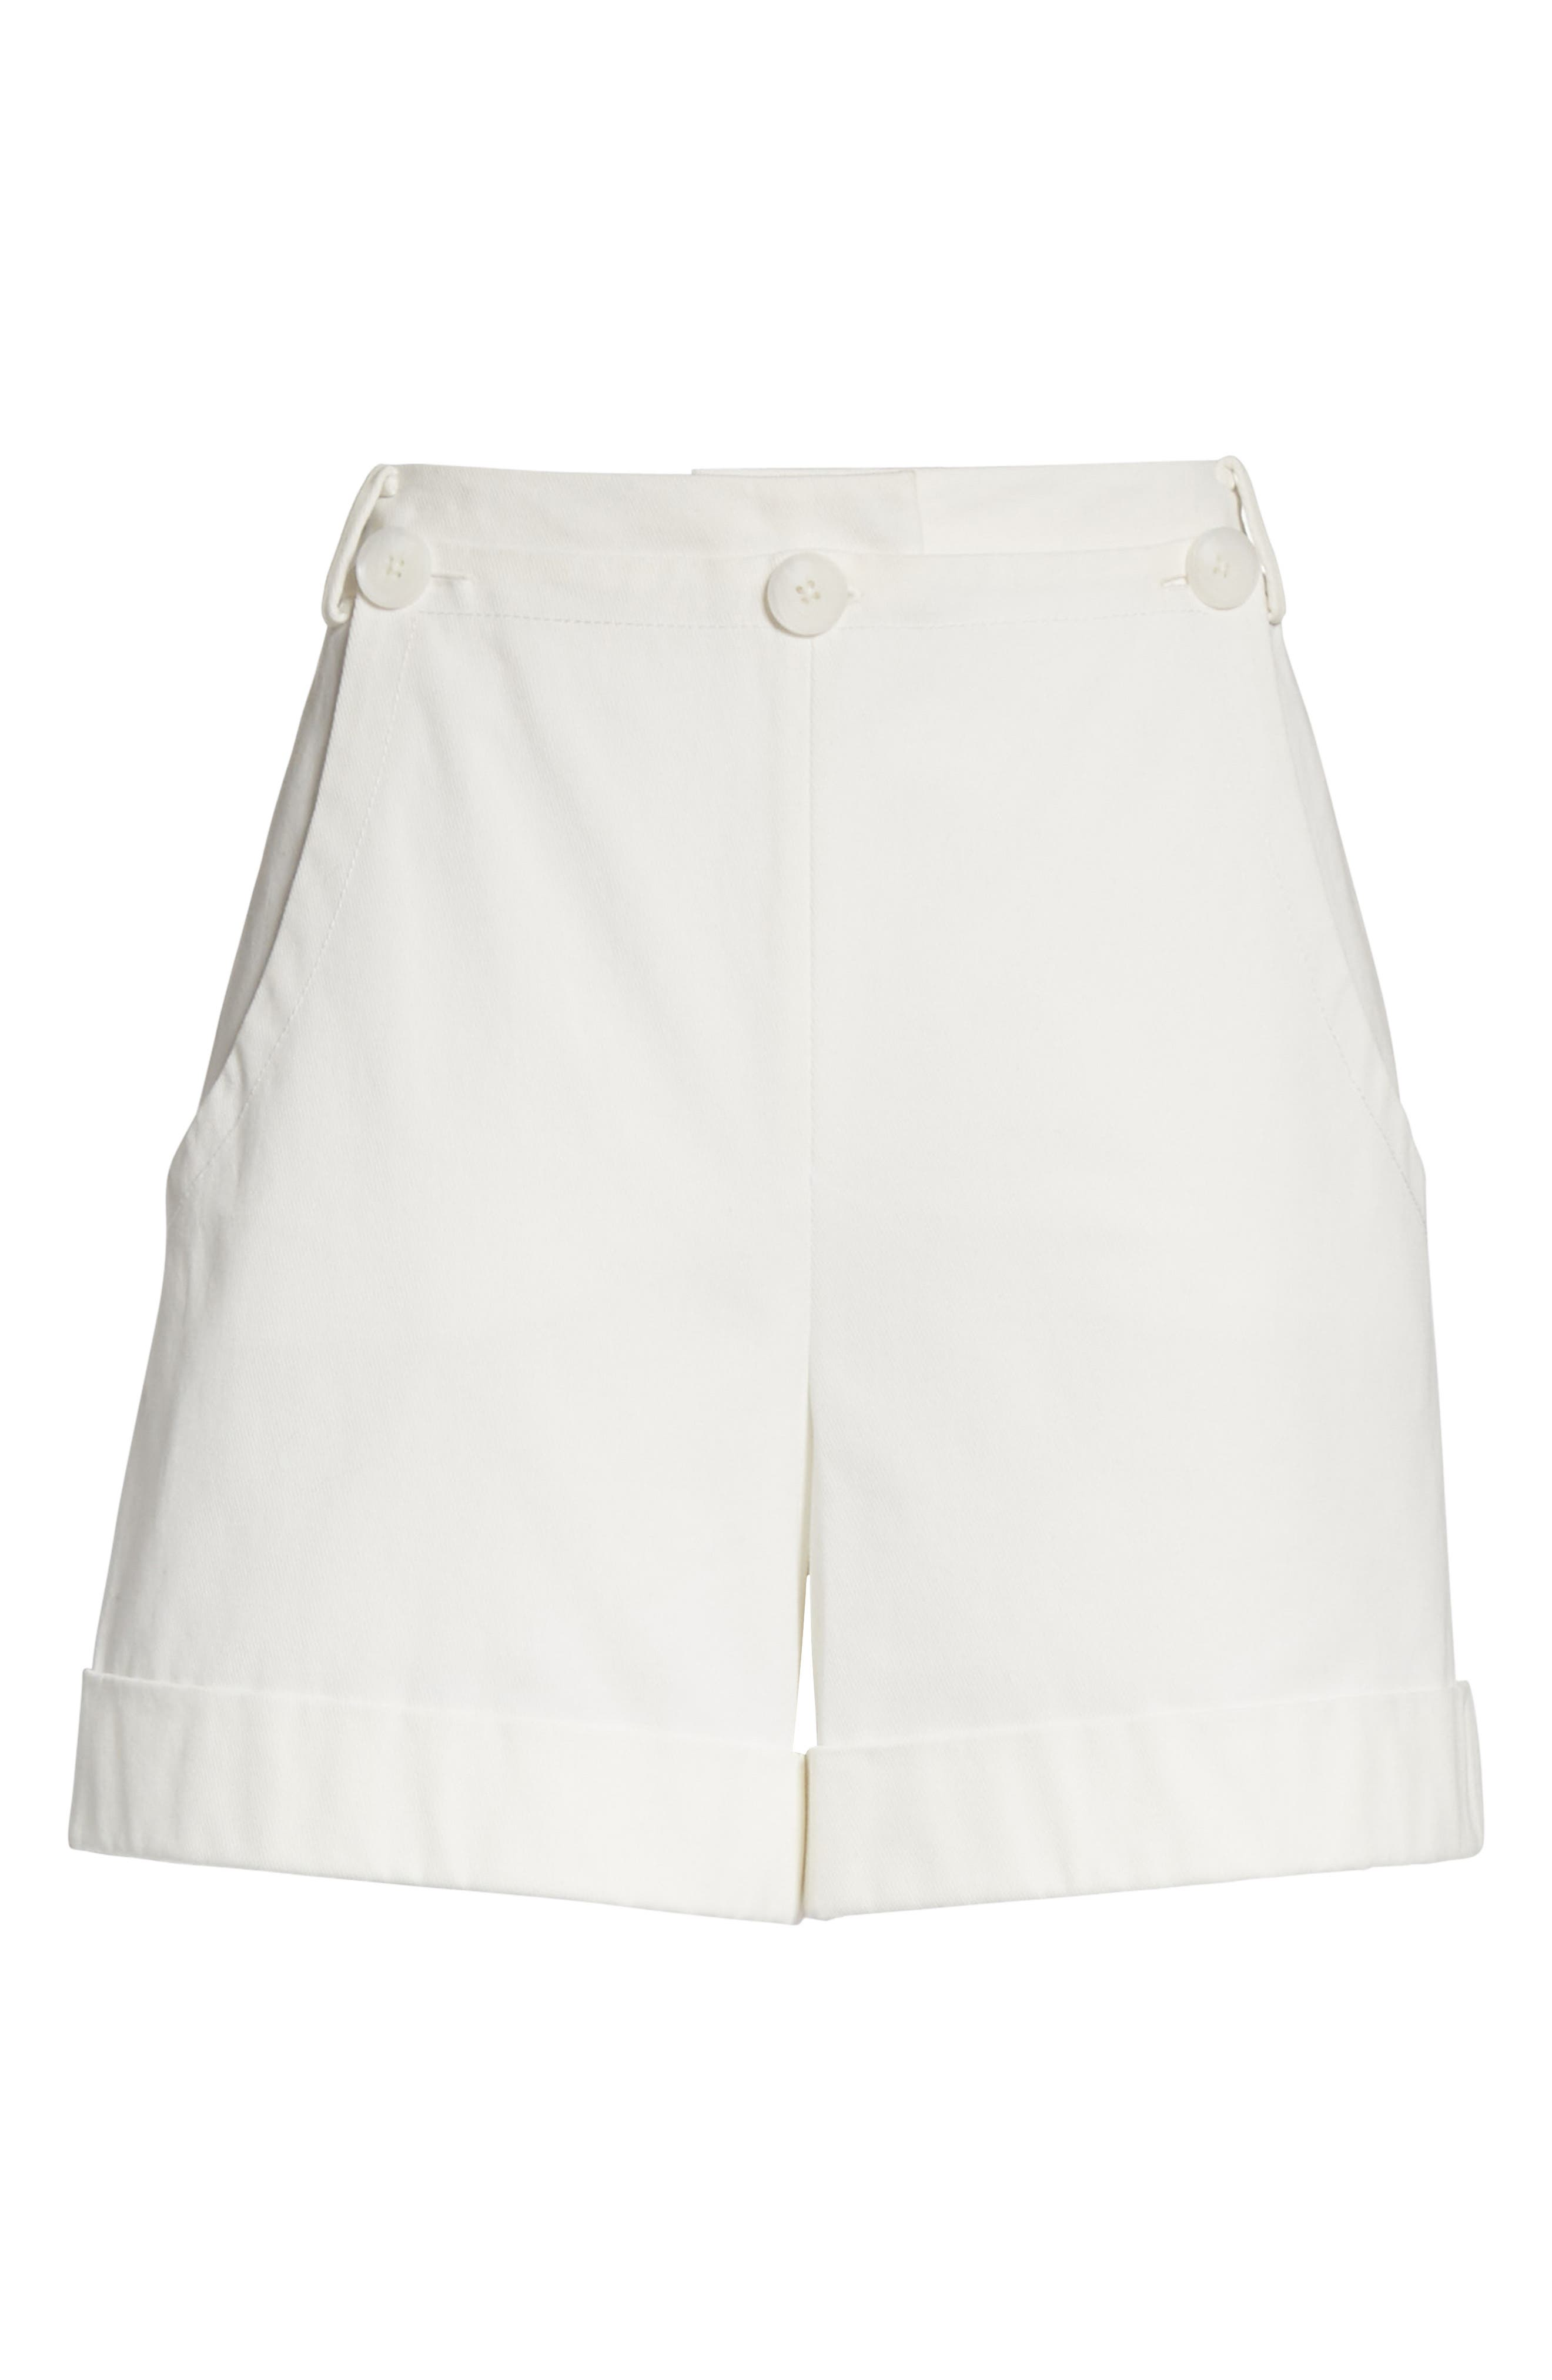 GREY Jason Wu Stretch Cotton Sailor Shorts,                             Alternate thumbnail 6, color,                             110